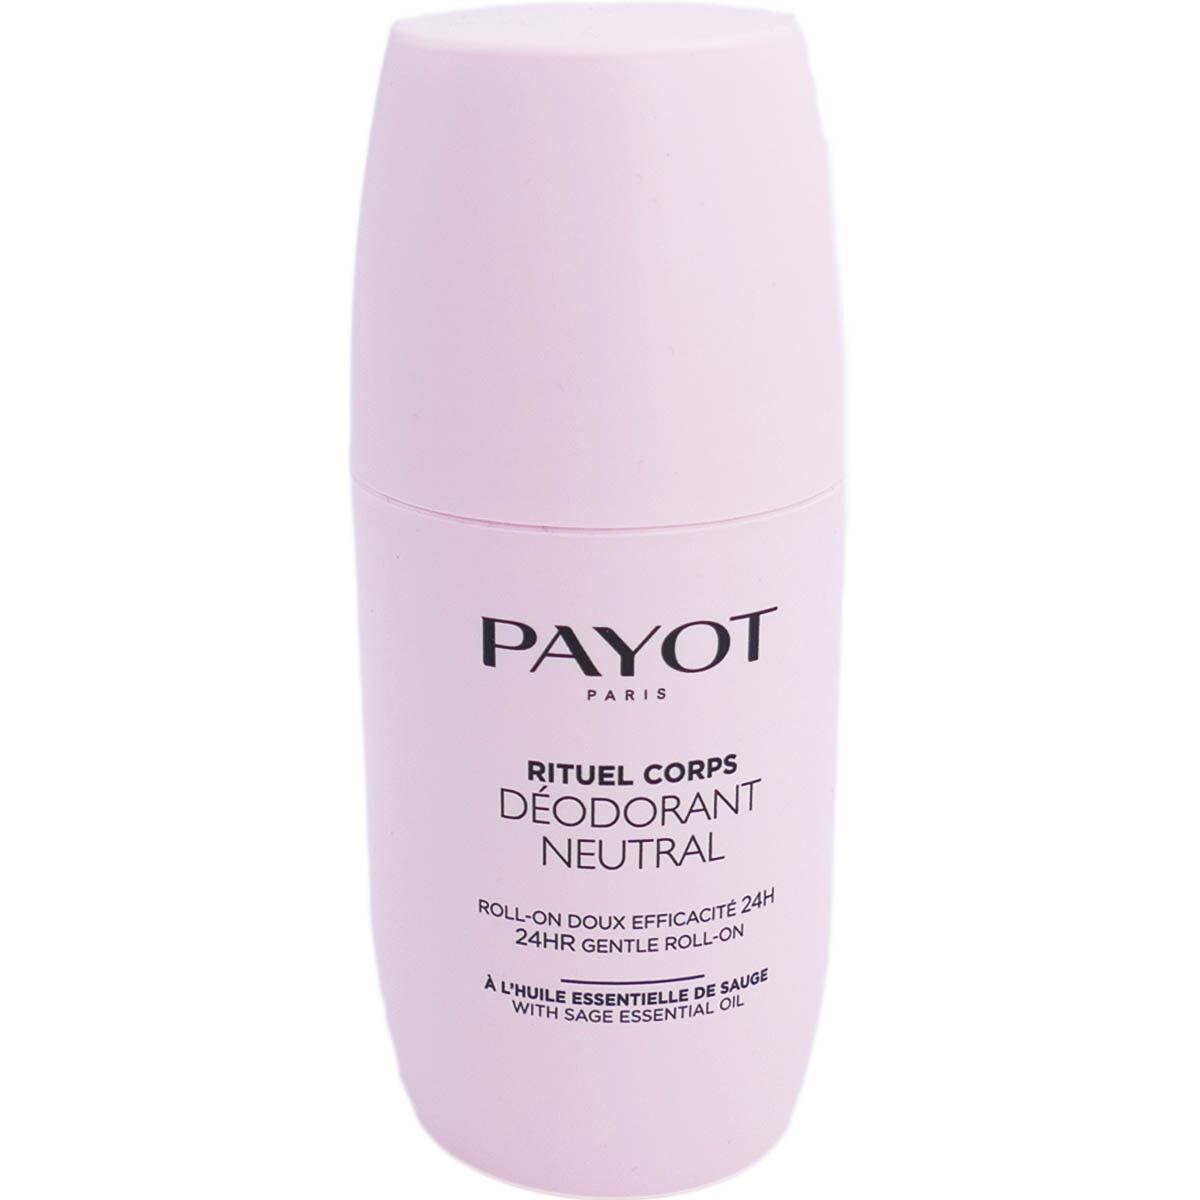 Payot rituel corps deodorant neutral 75ml